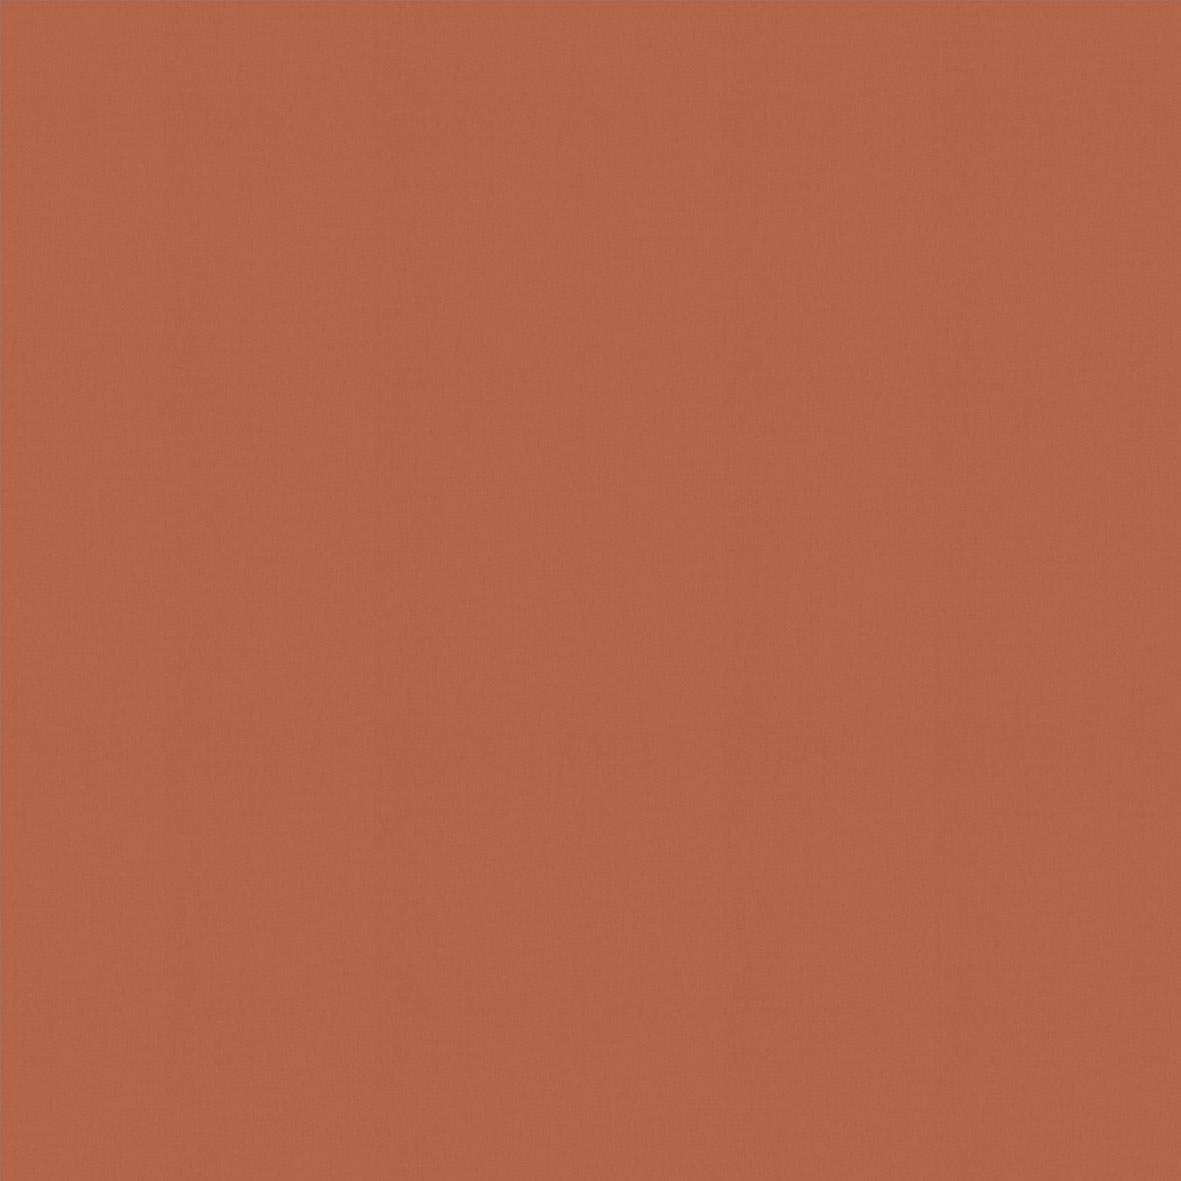 Roller_Swatch_Palette_Copper_RE0053